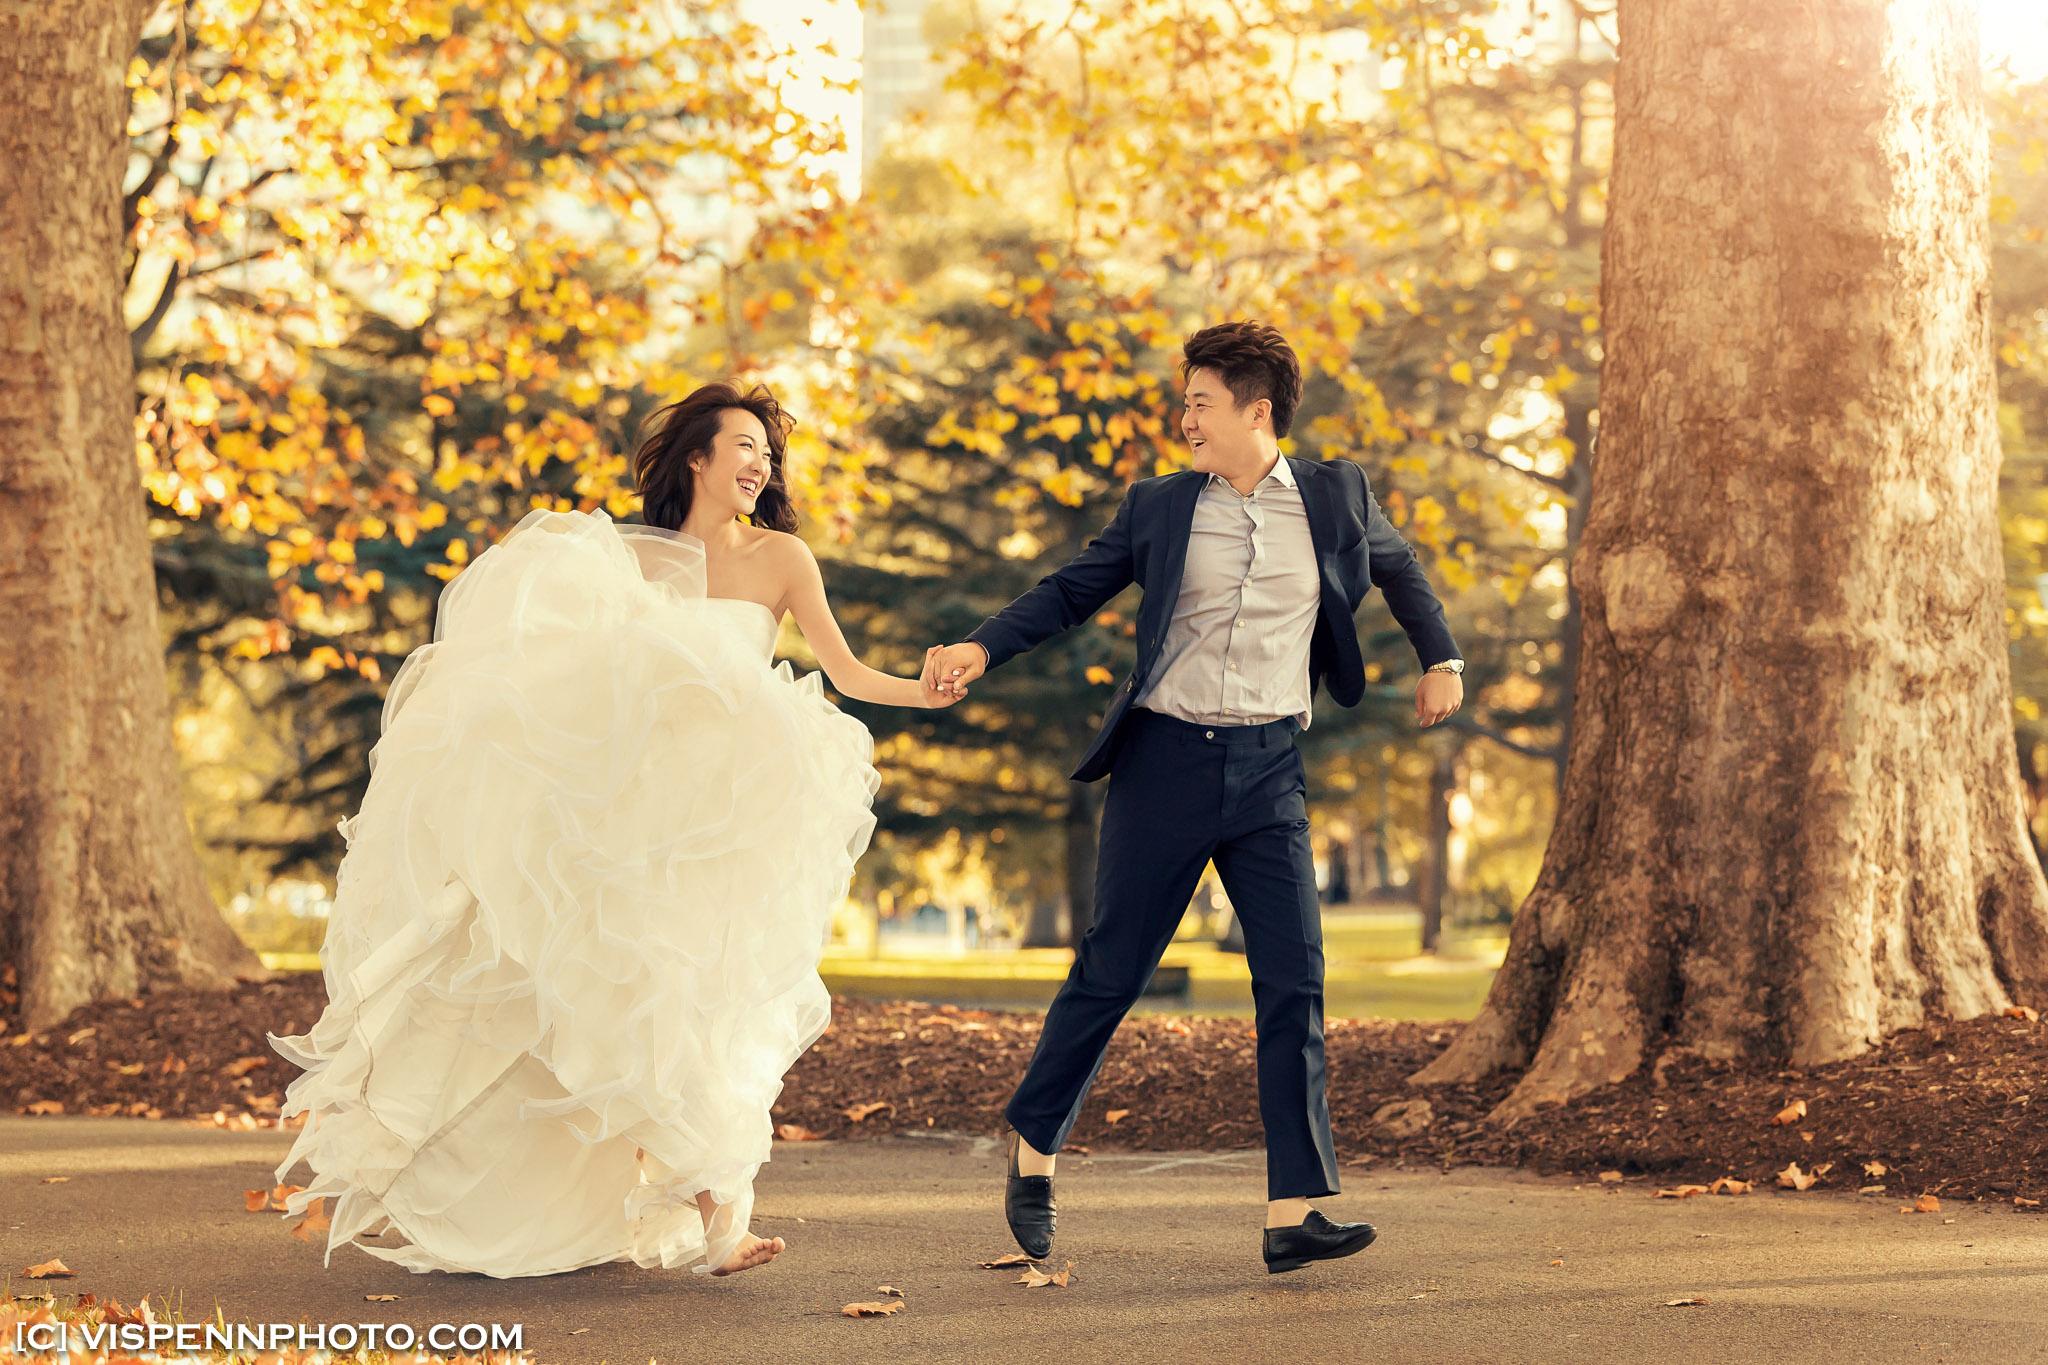 PRE WEDDING Photography Melbourne VISPENN 墨尔本 婚纱照 结婚照 婚纱摄影 5D1 3003